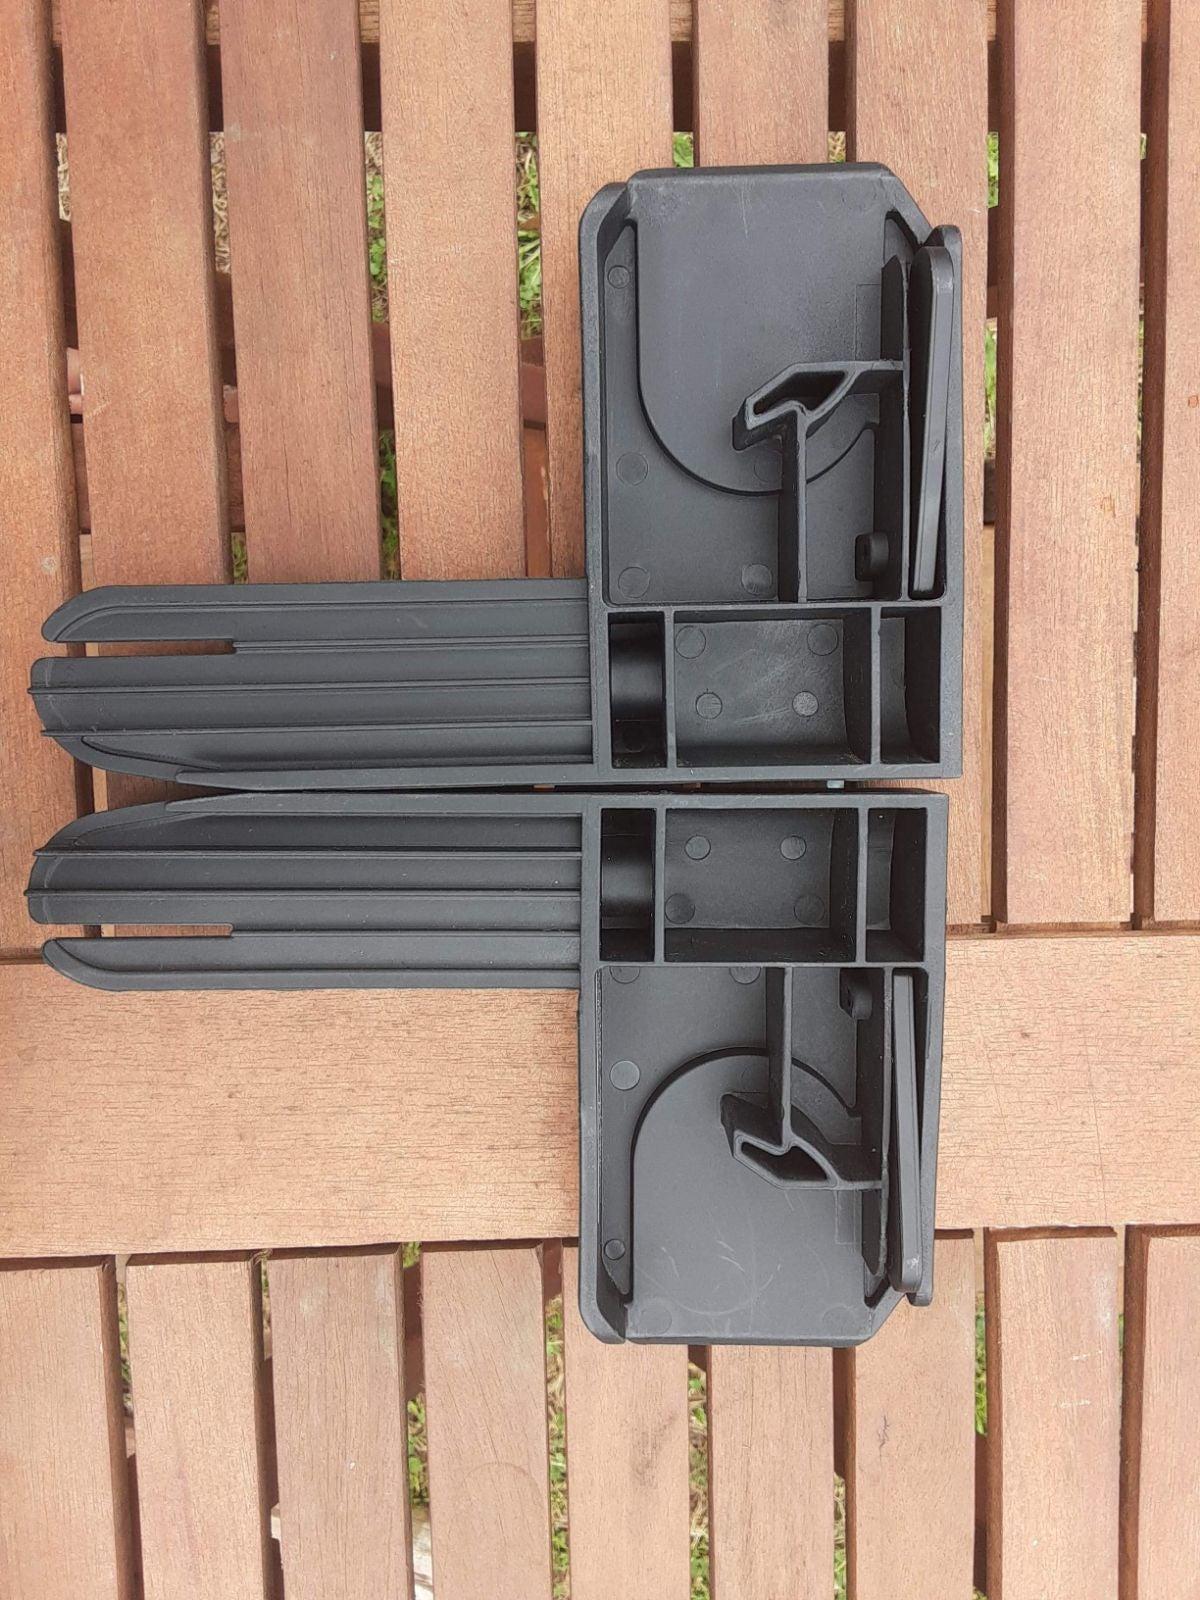 Austlen car seat adapter for Maxi cosi